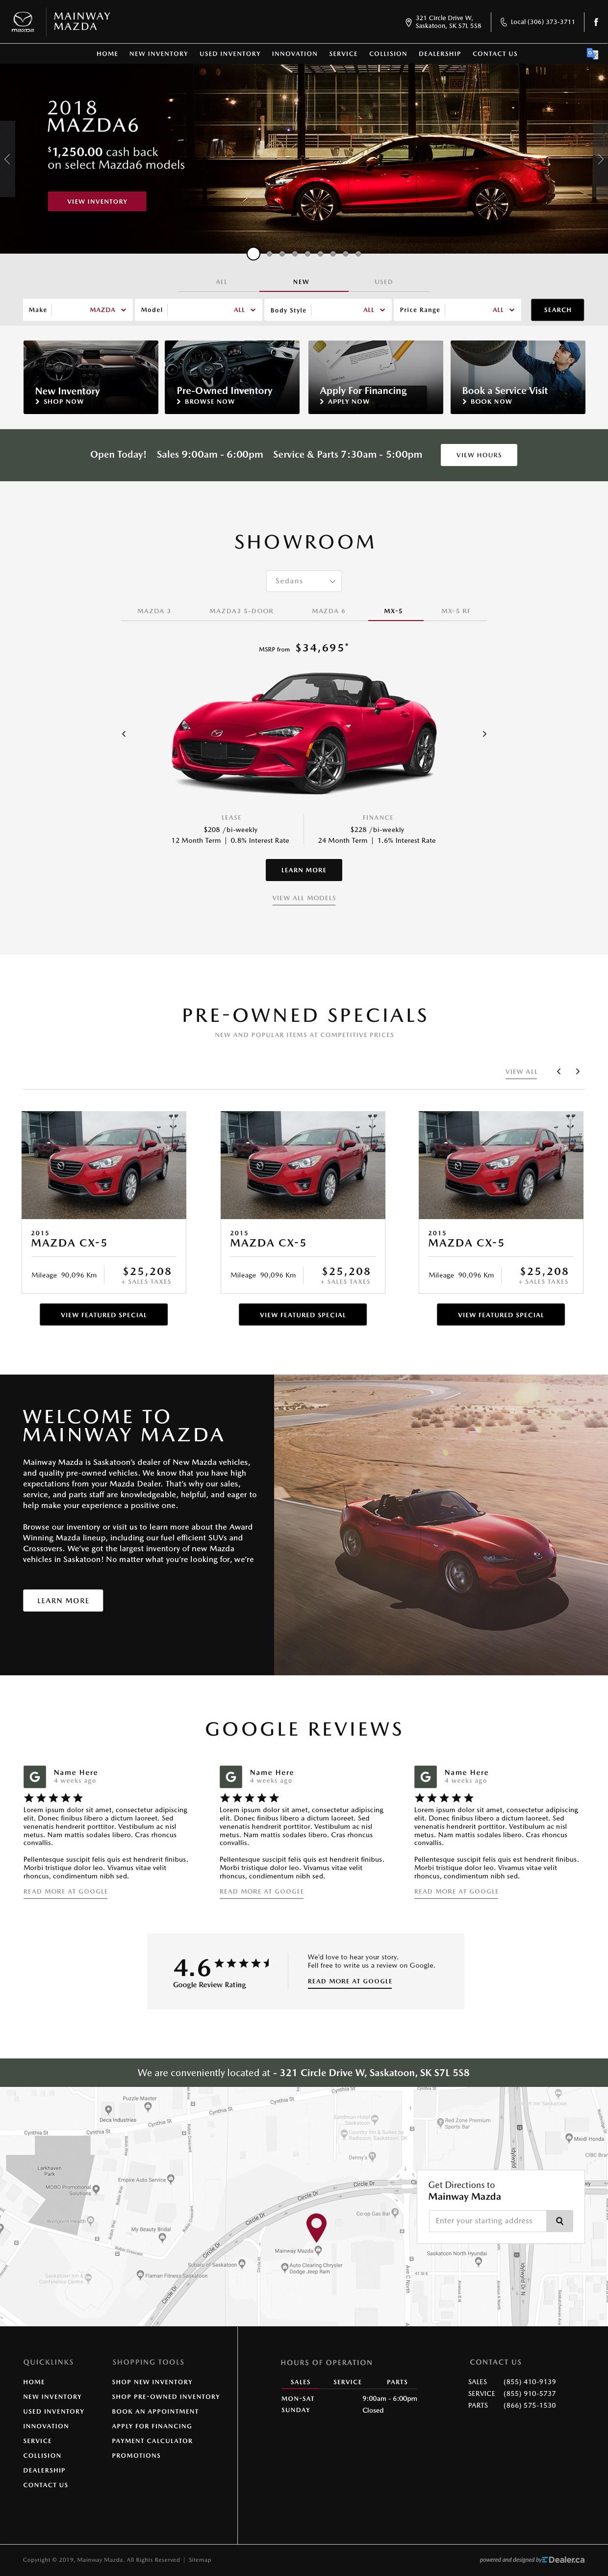 Mainway Mazda